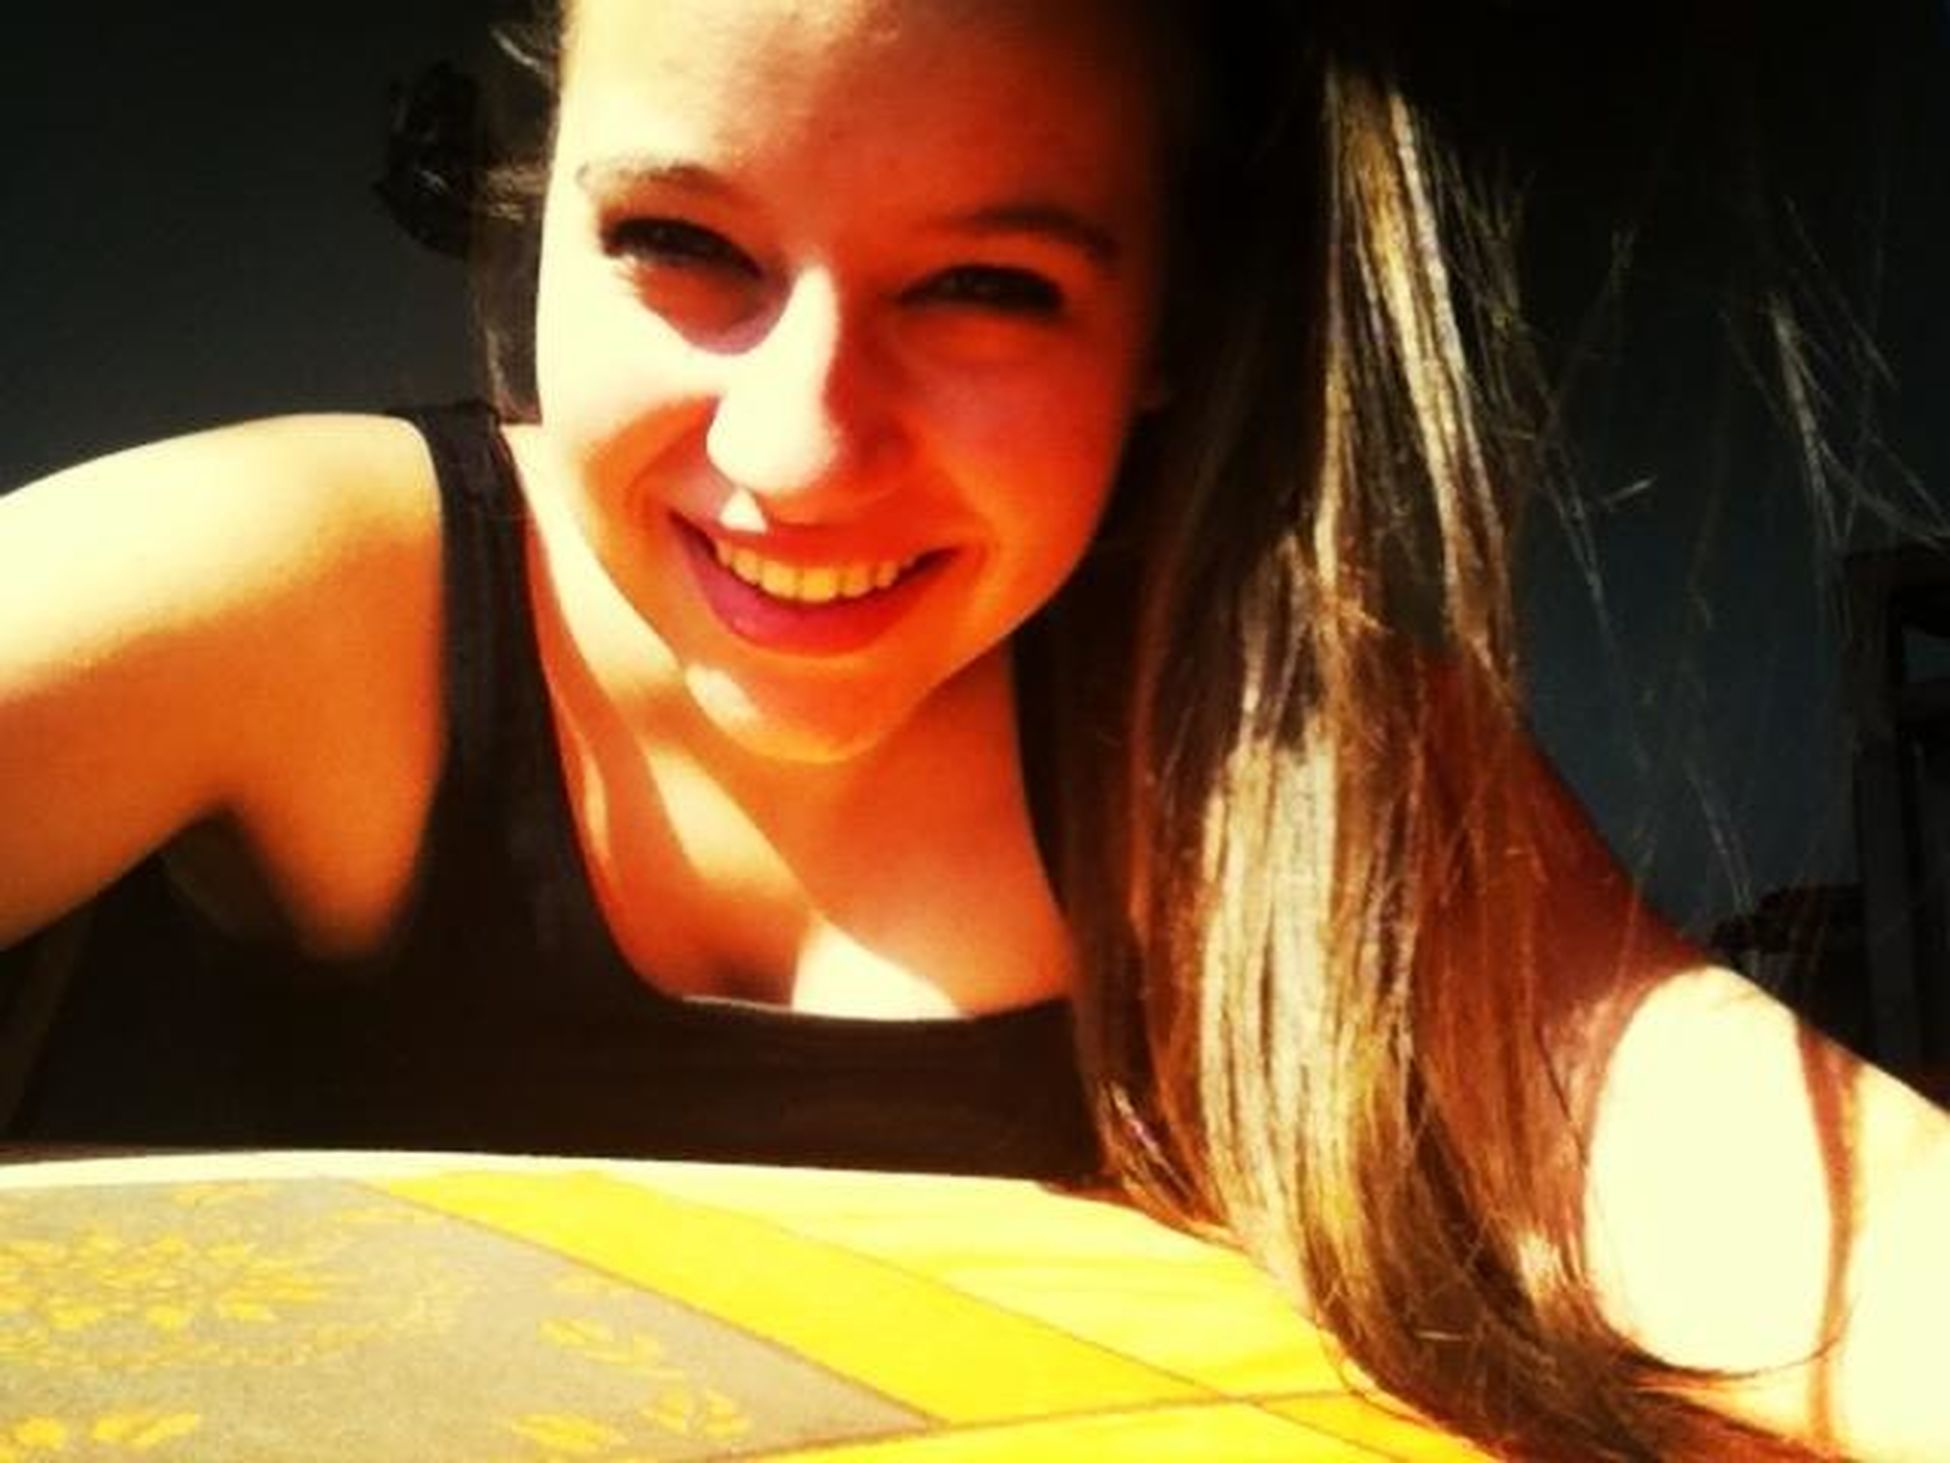 Sunshine On My Face